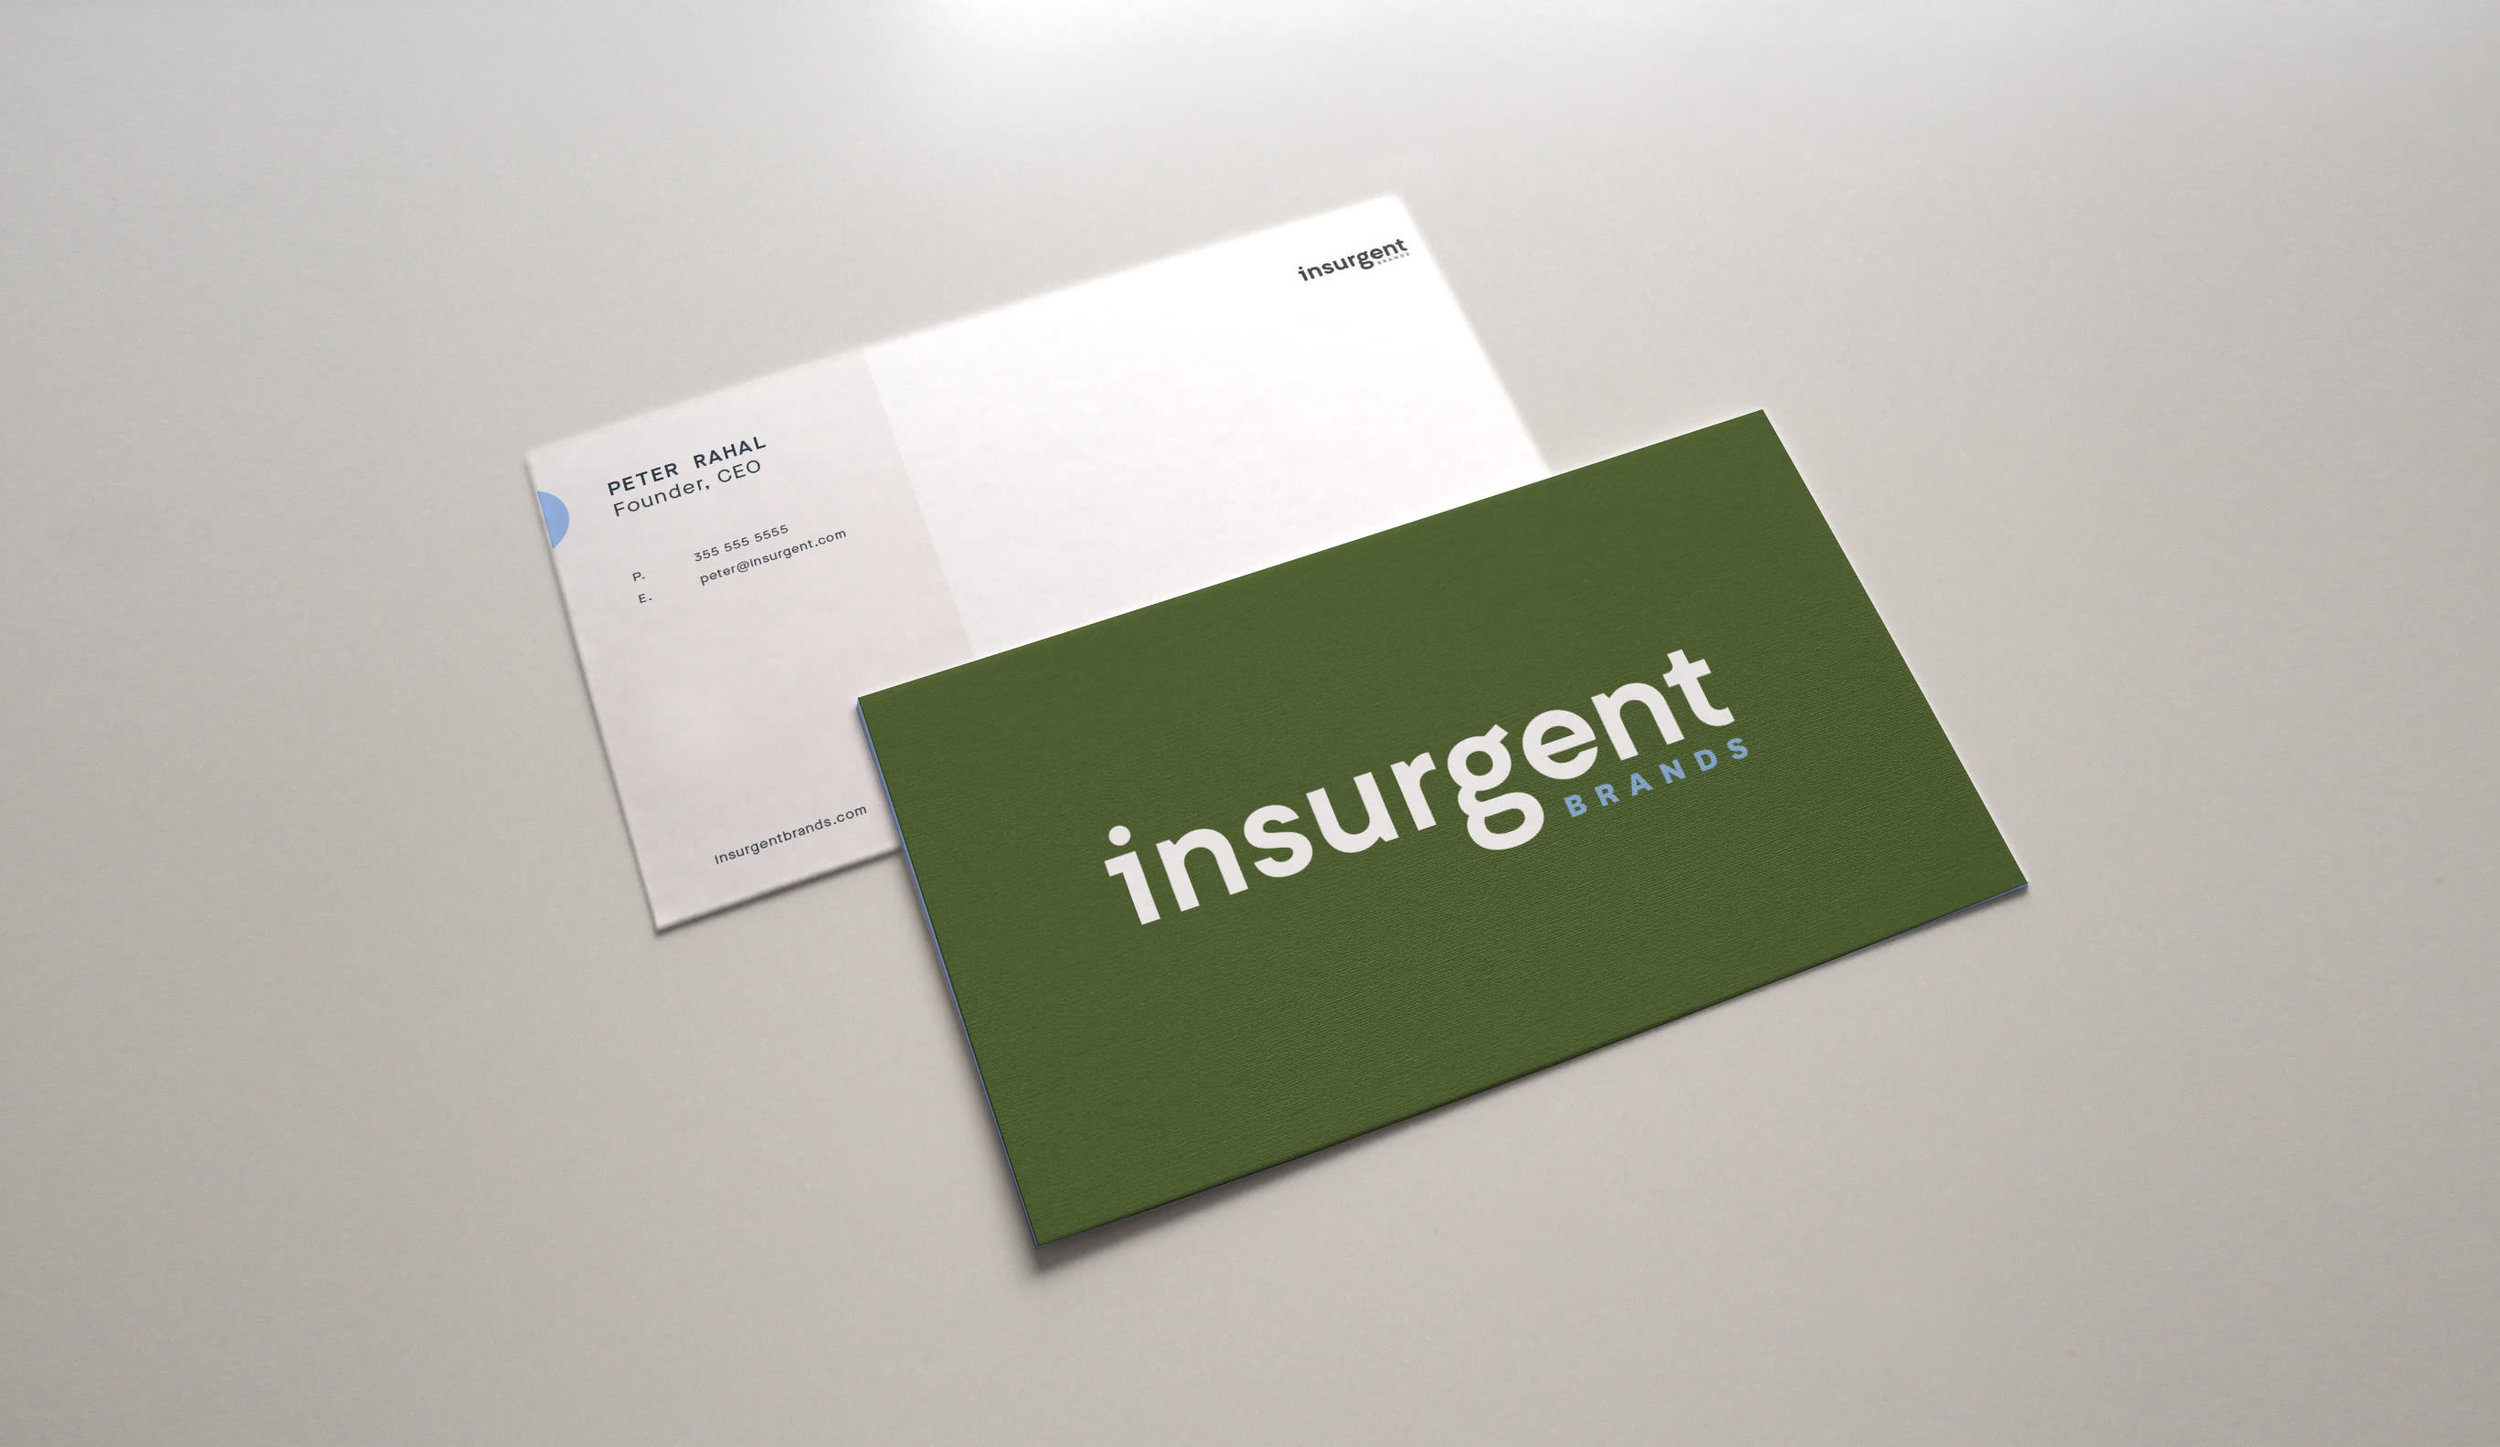 Insurgent_BusinessCards_Comp.jpg